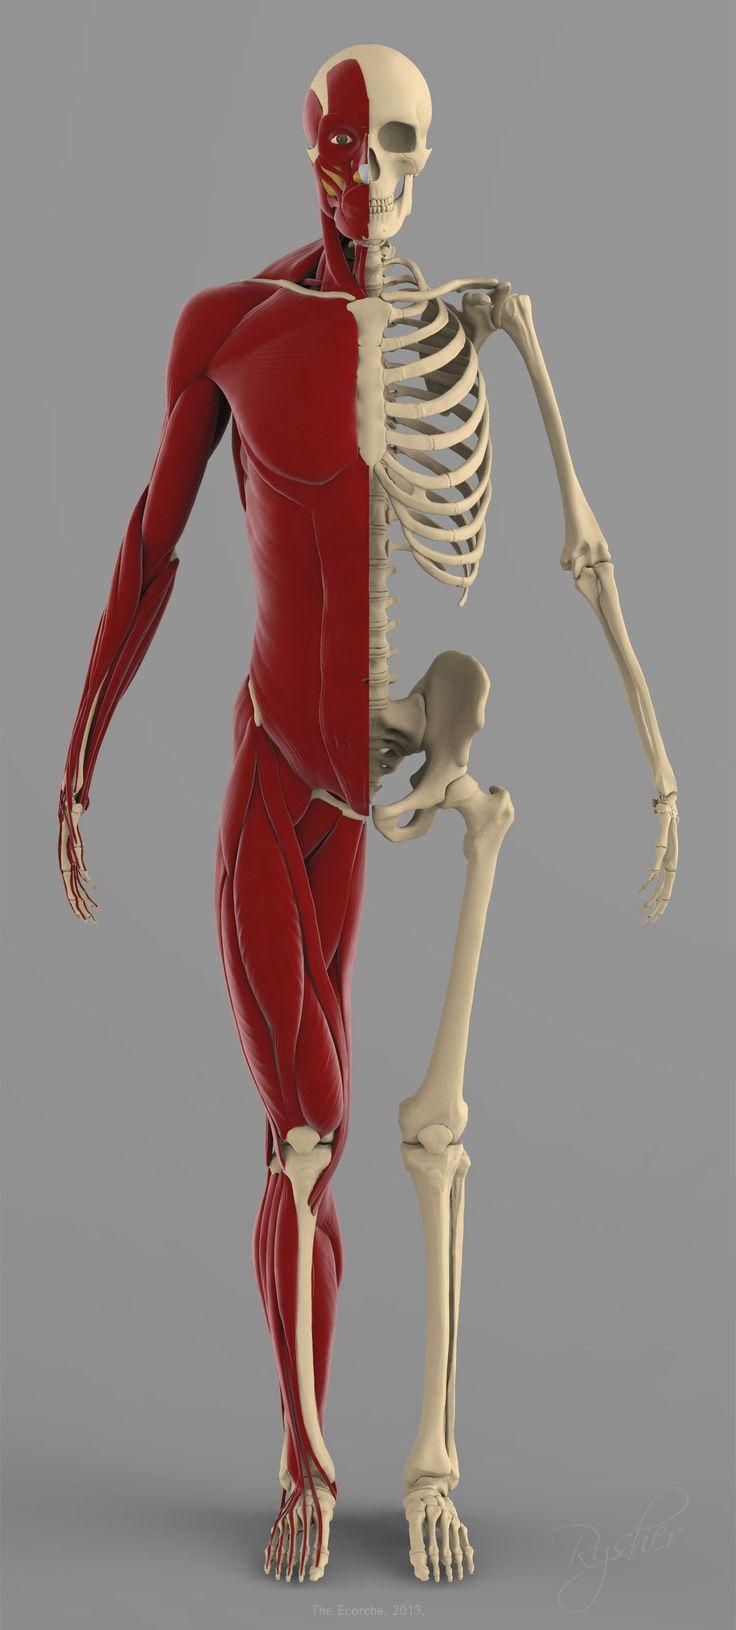 Best 25+ Human skeleton model ideas on Pinterest | Human ...